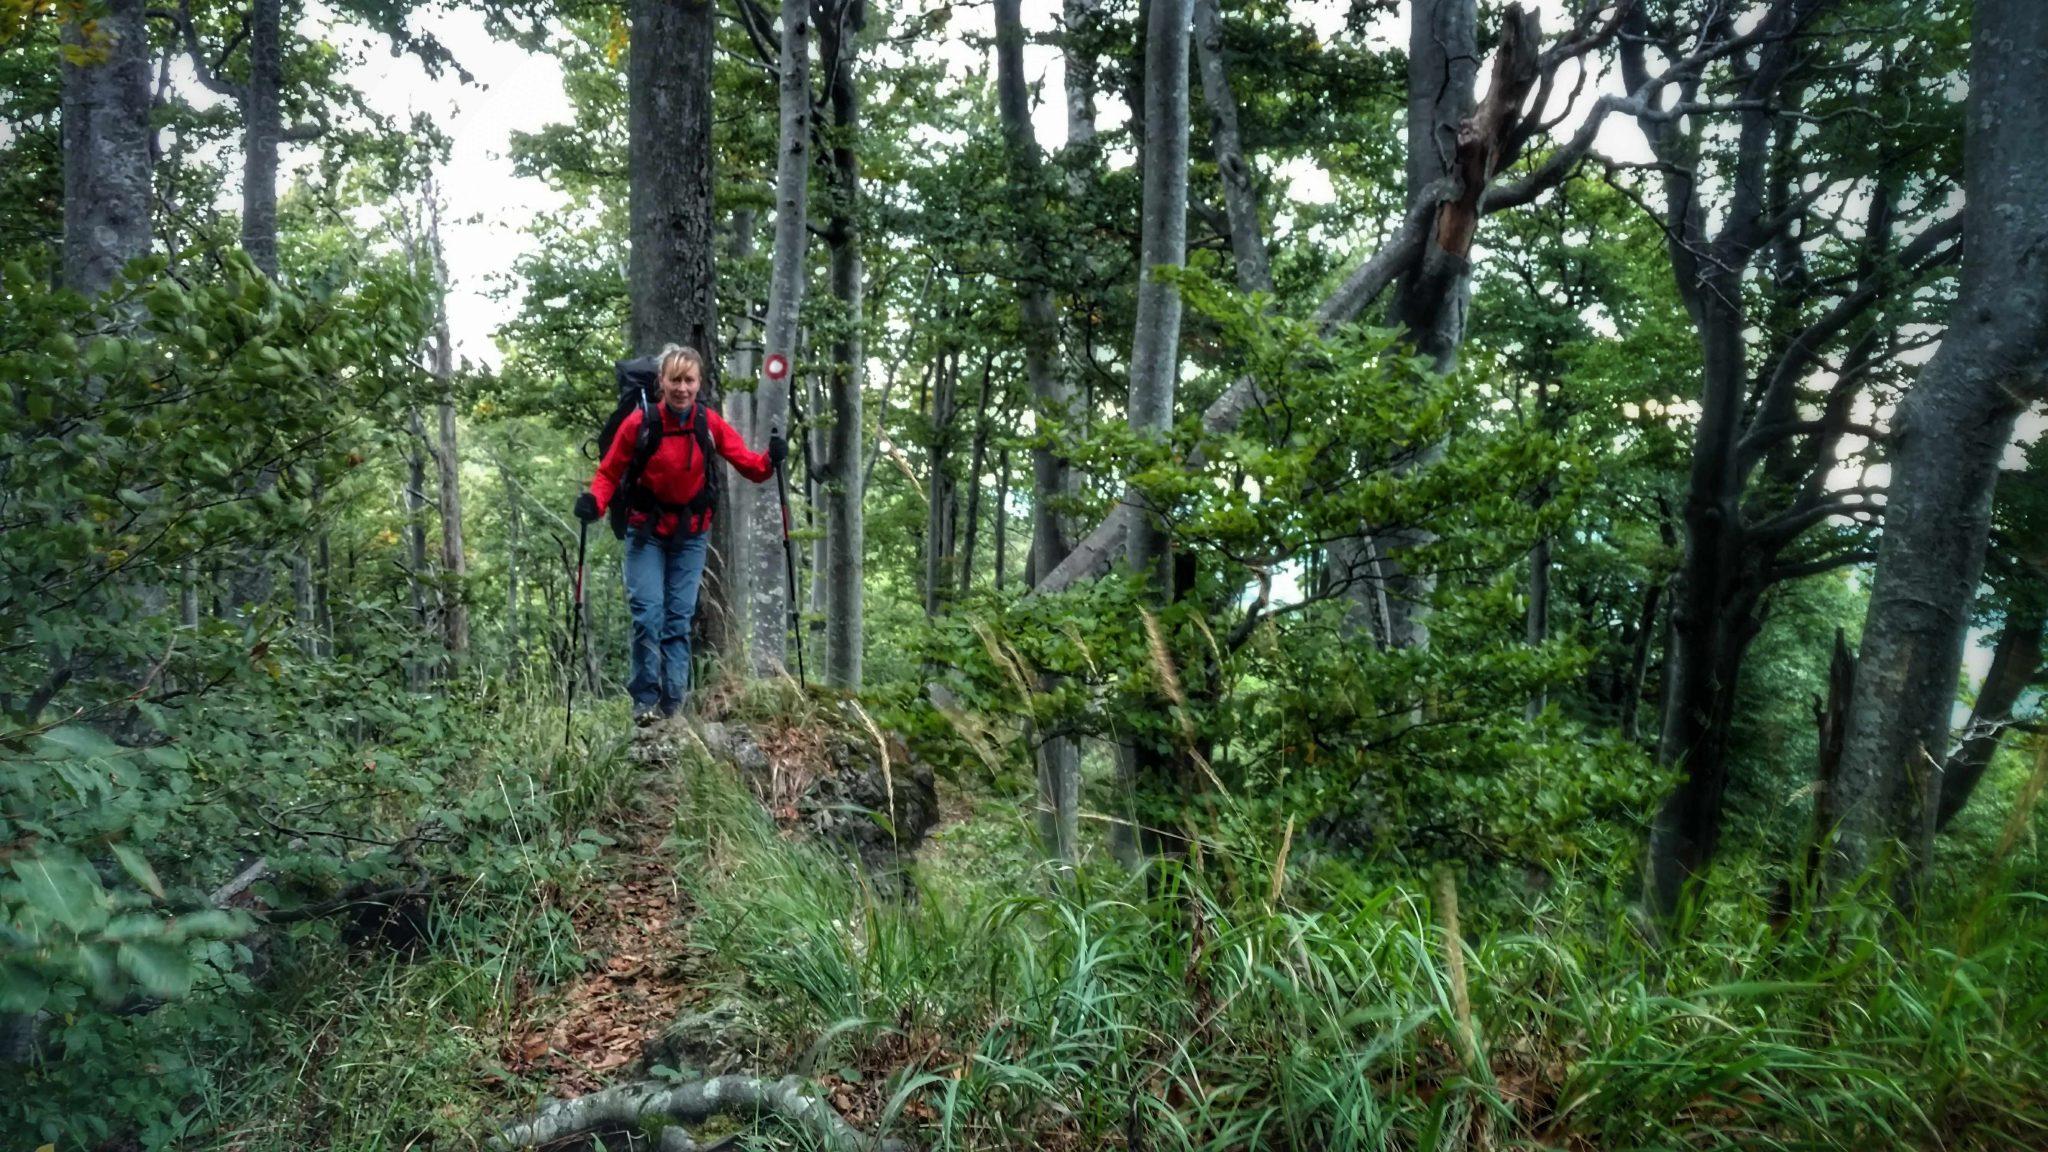 Green_trail_rode_jas